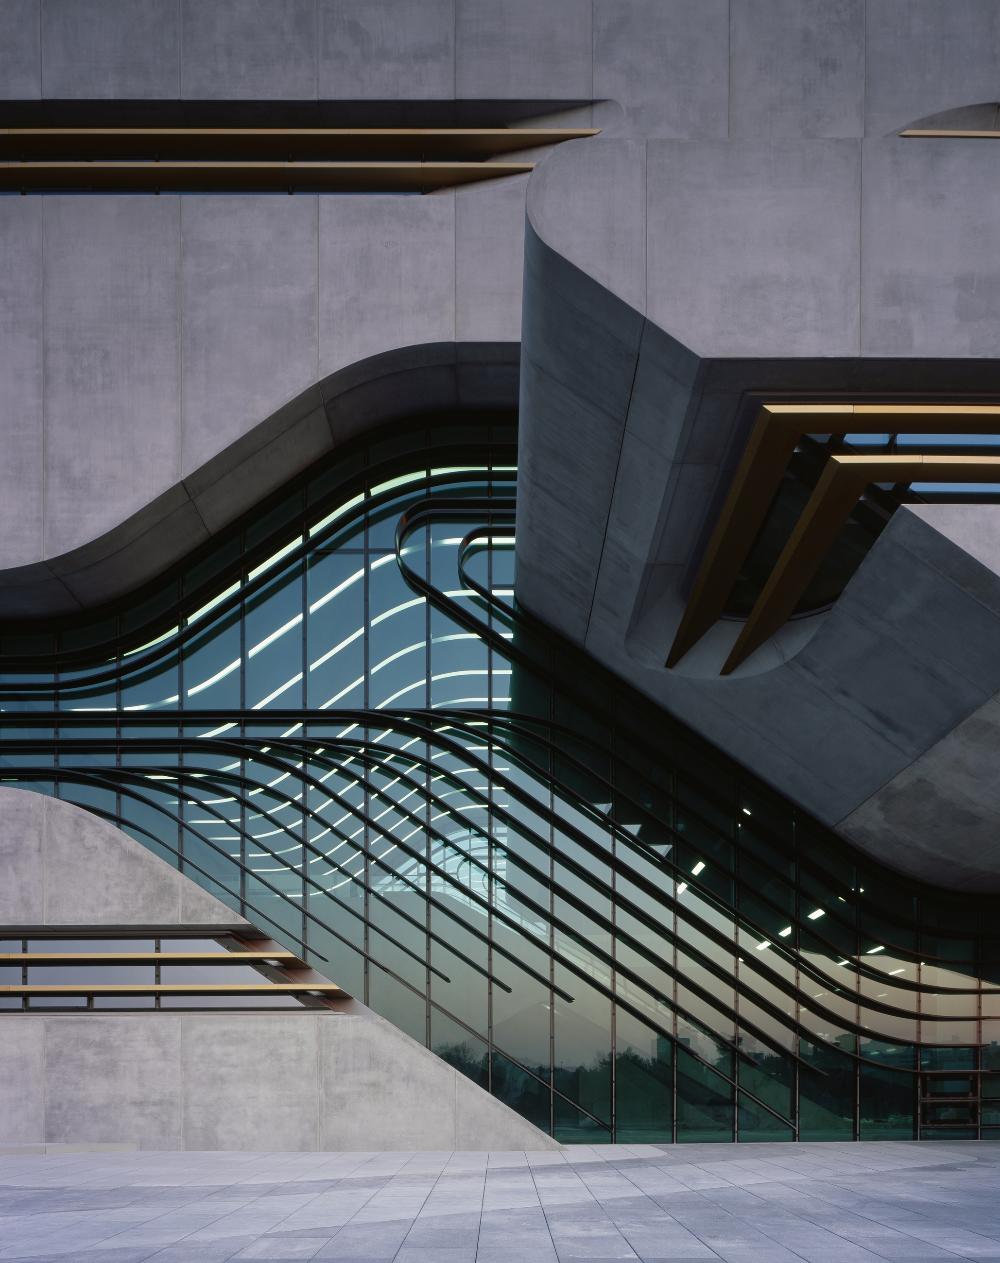 Pierres Vives Zaha Hadid Architects Reynaers Aluminium Urbastyle Archello Zaha Hadid Architecture Zaha Hadid Architects Interior Architecture Design